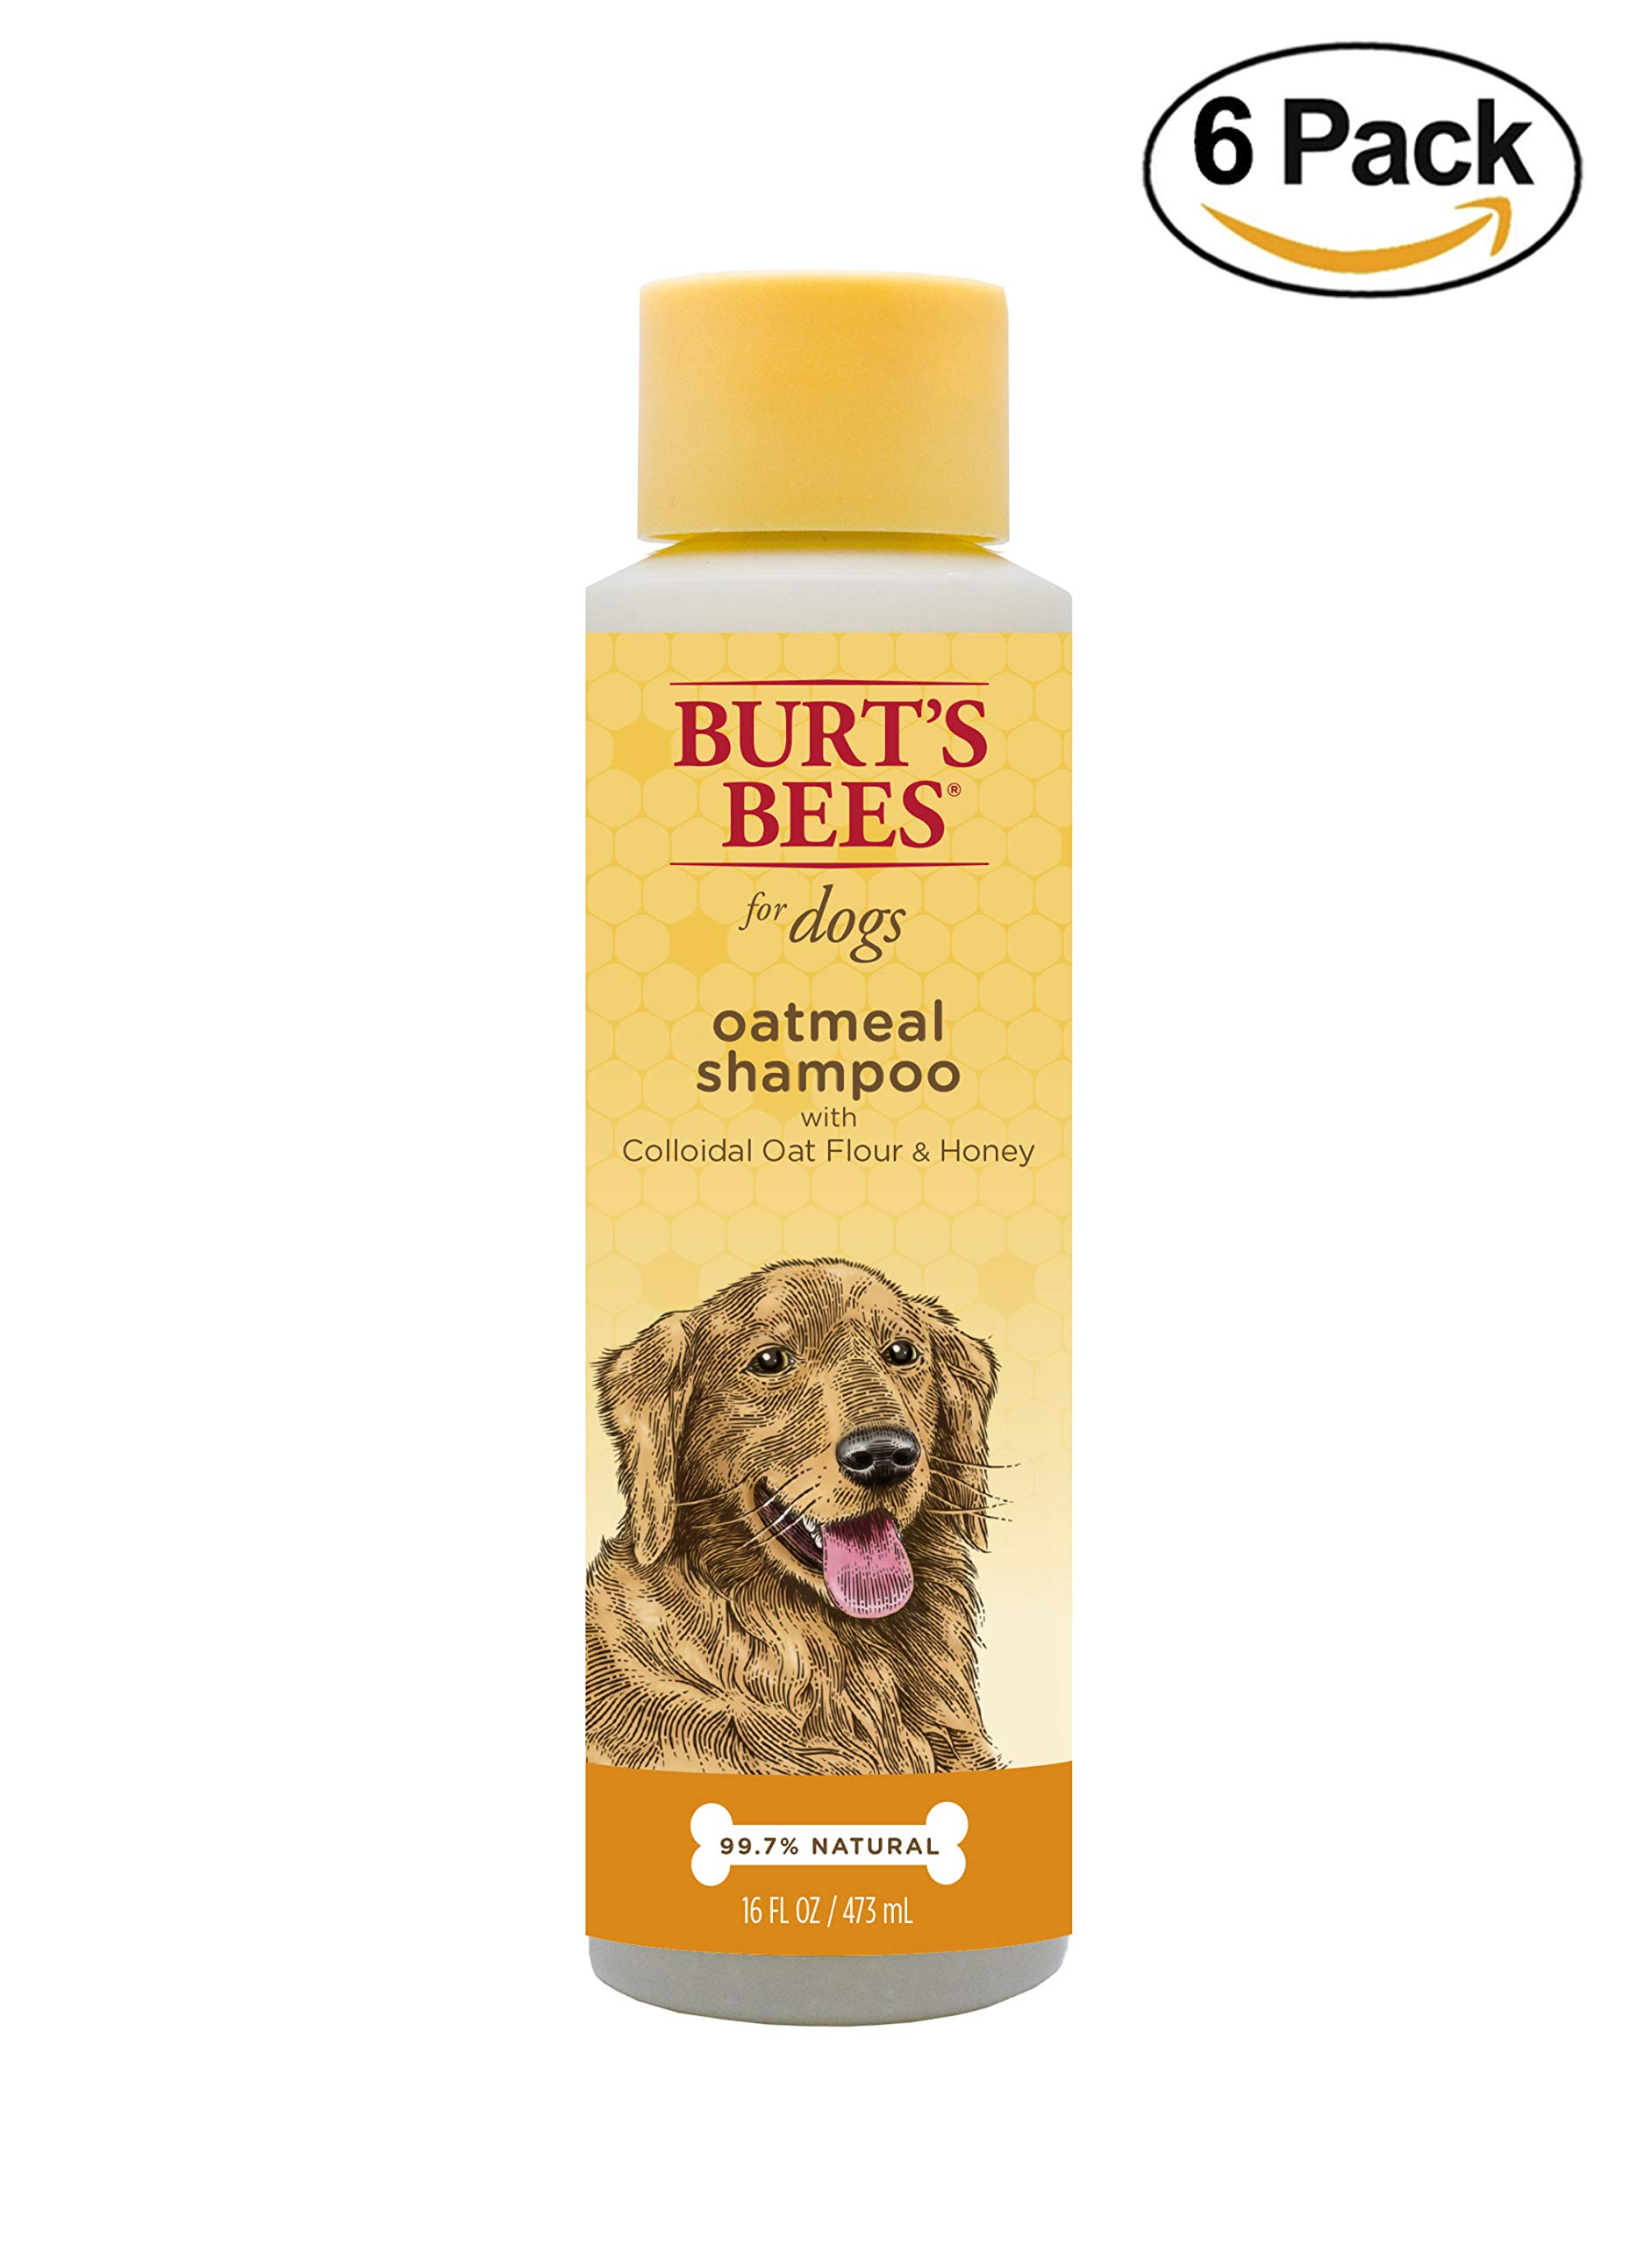 Burt's Bees All Natural Oatmeal Shampoo for Dogs | Made with Colloidal Oat Flour and Honey | Moisturizing Oatmeal Dog Shampoo, 16 Ounces, Pack of 6